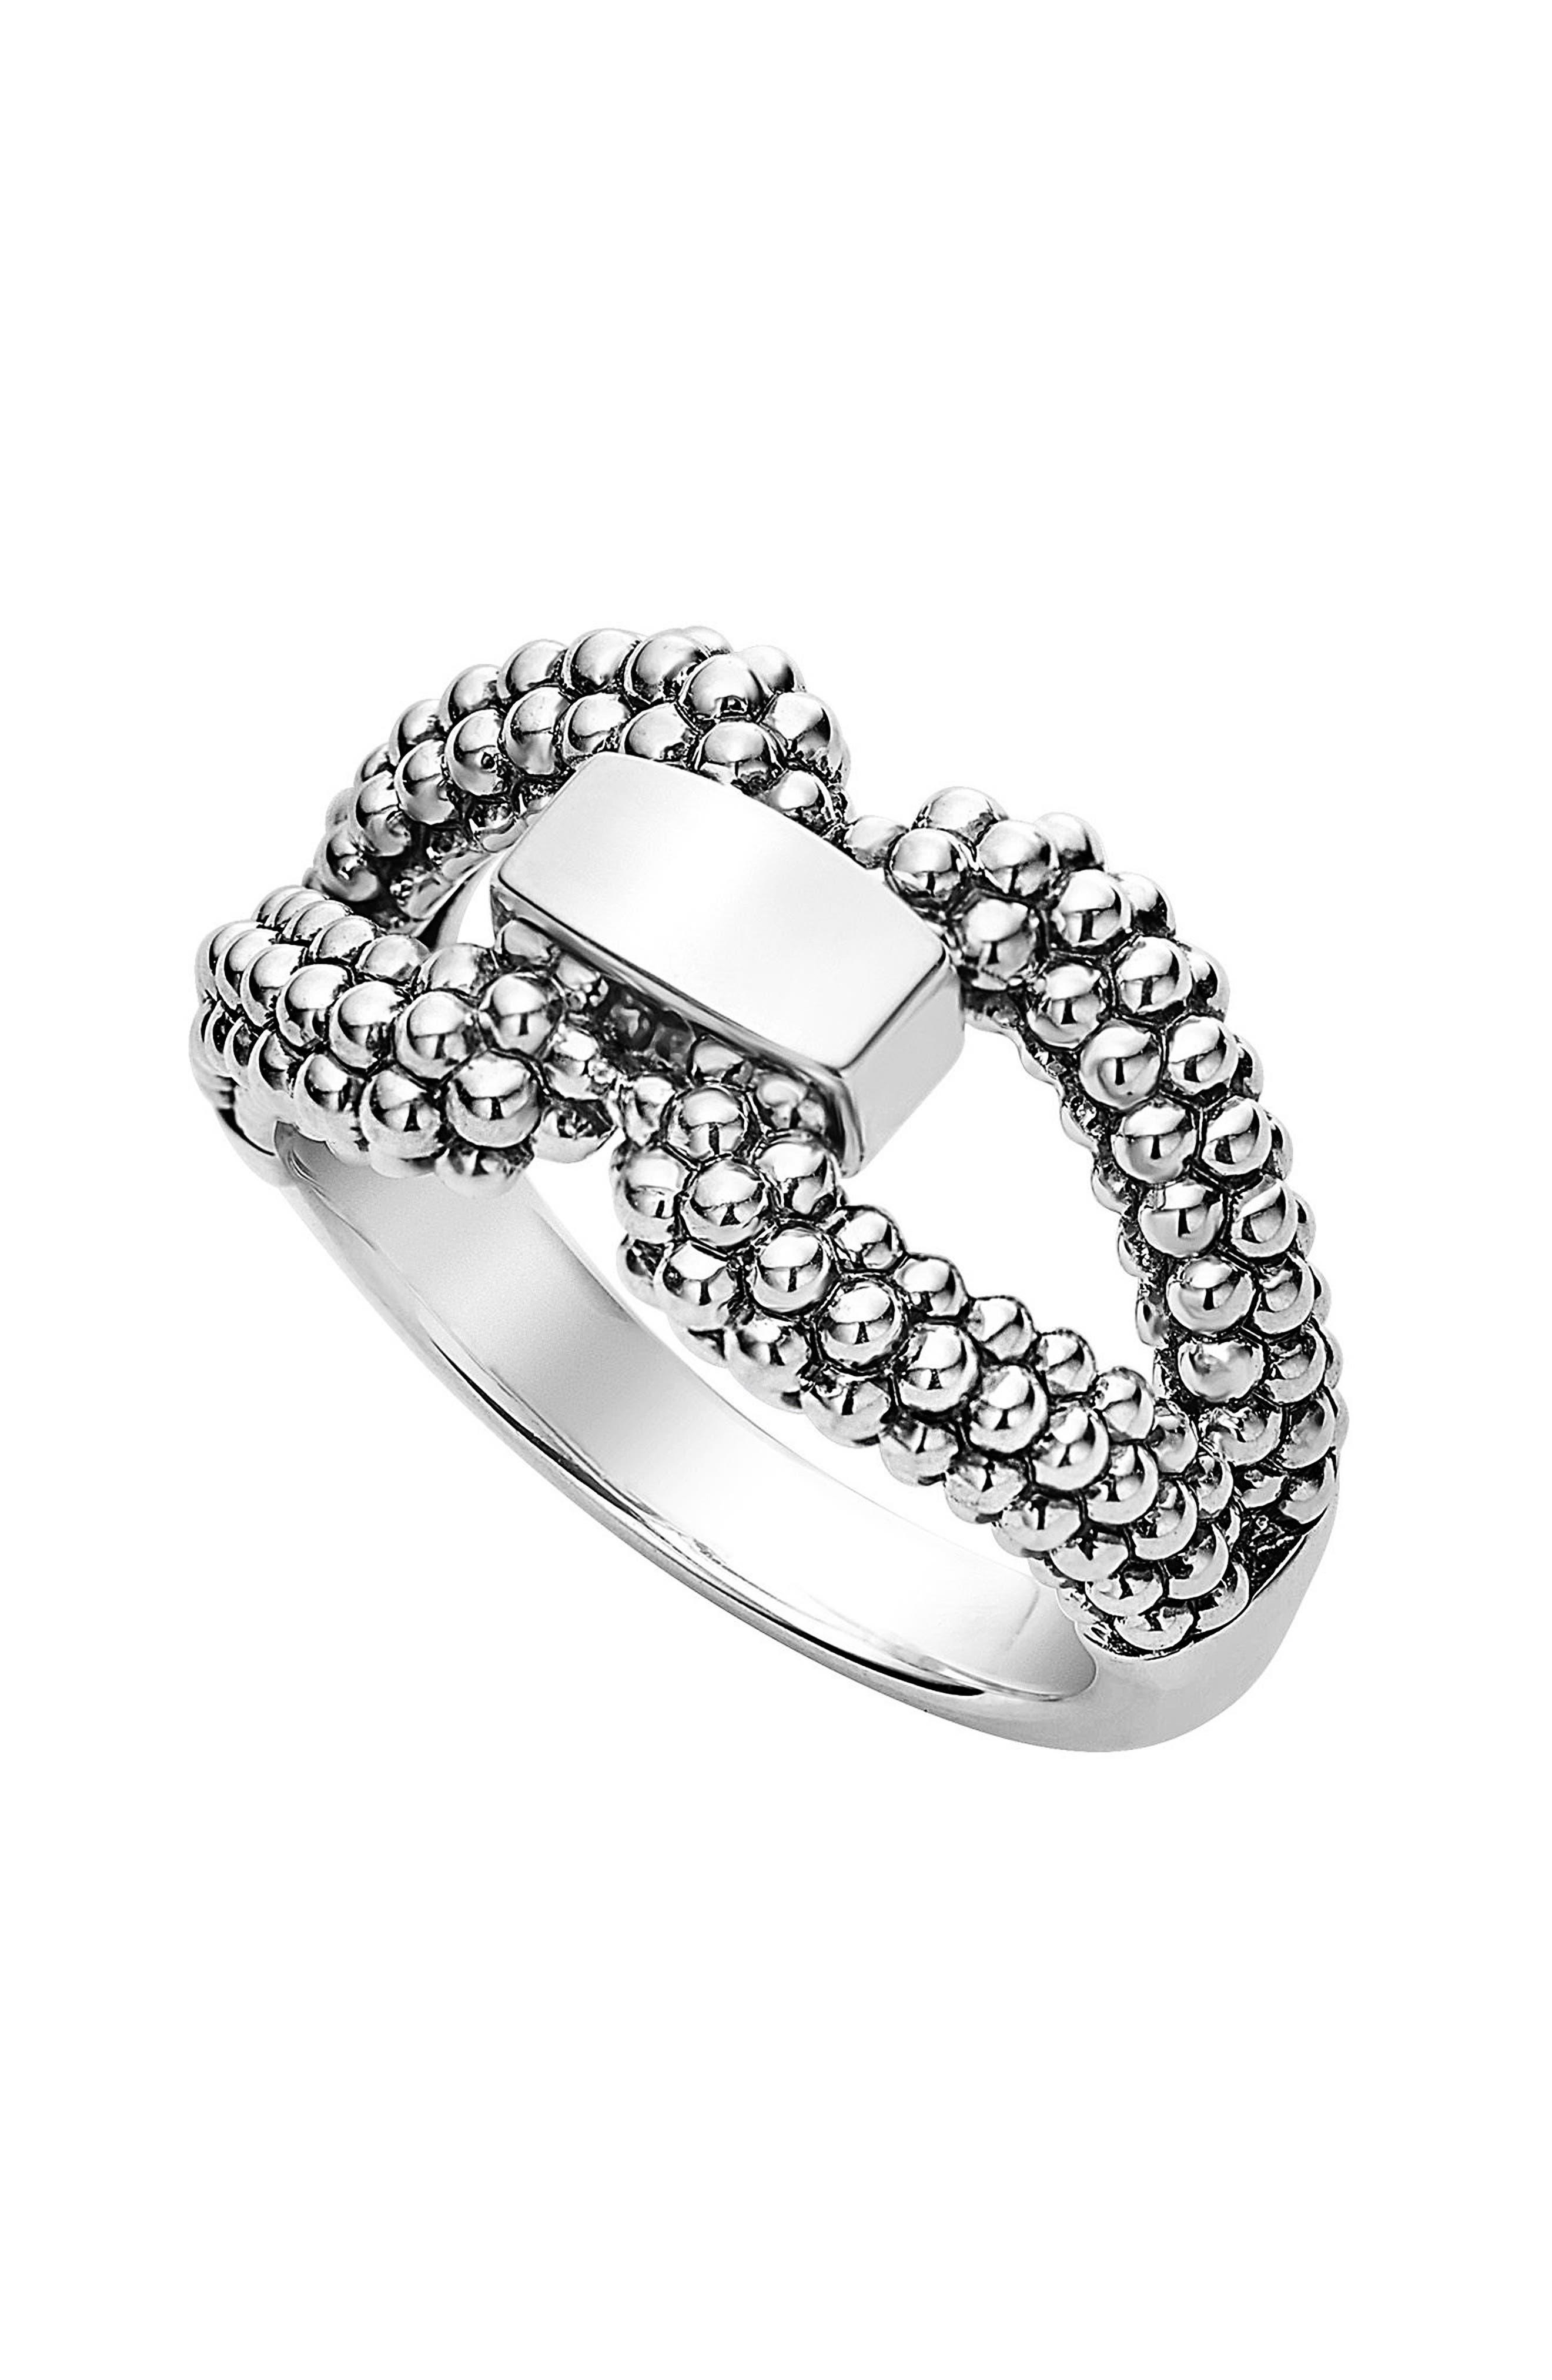 Derby Caviar Ring,                             Main thumbnail 1, color,                             040